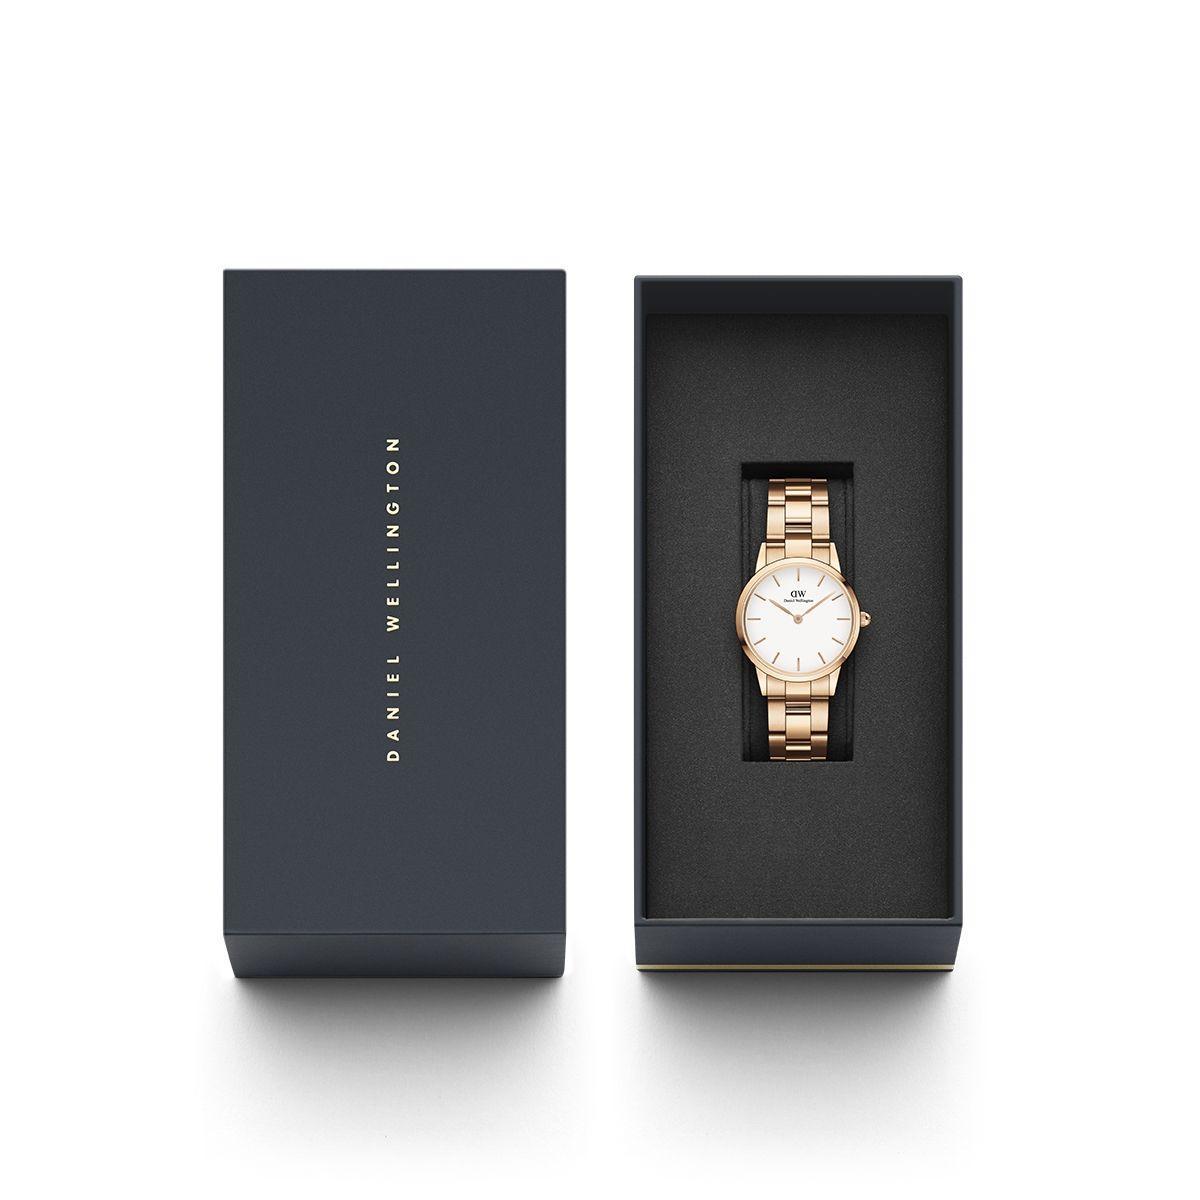 dw官网 dw手表官网 dw中国官网 dw官方旗舰店 DW DW官网  Watch Iconic Link RG 28mm